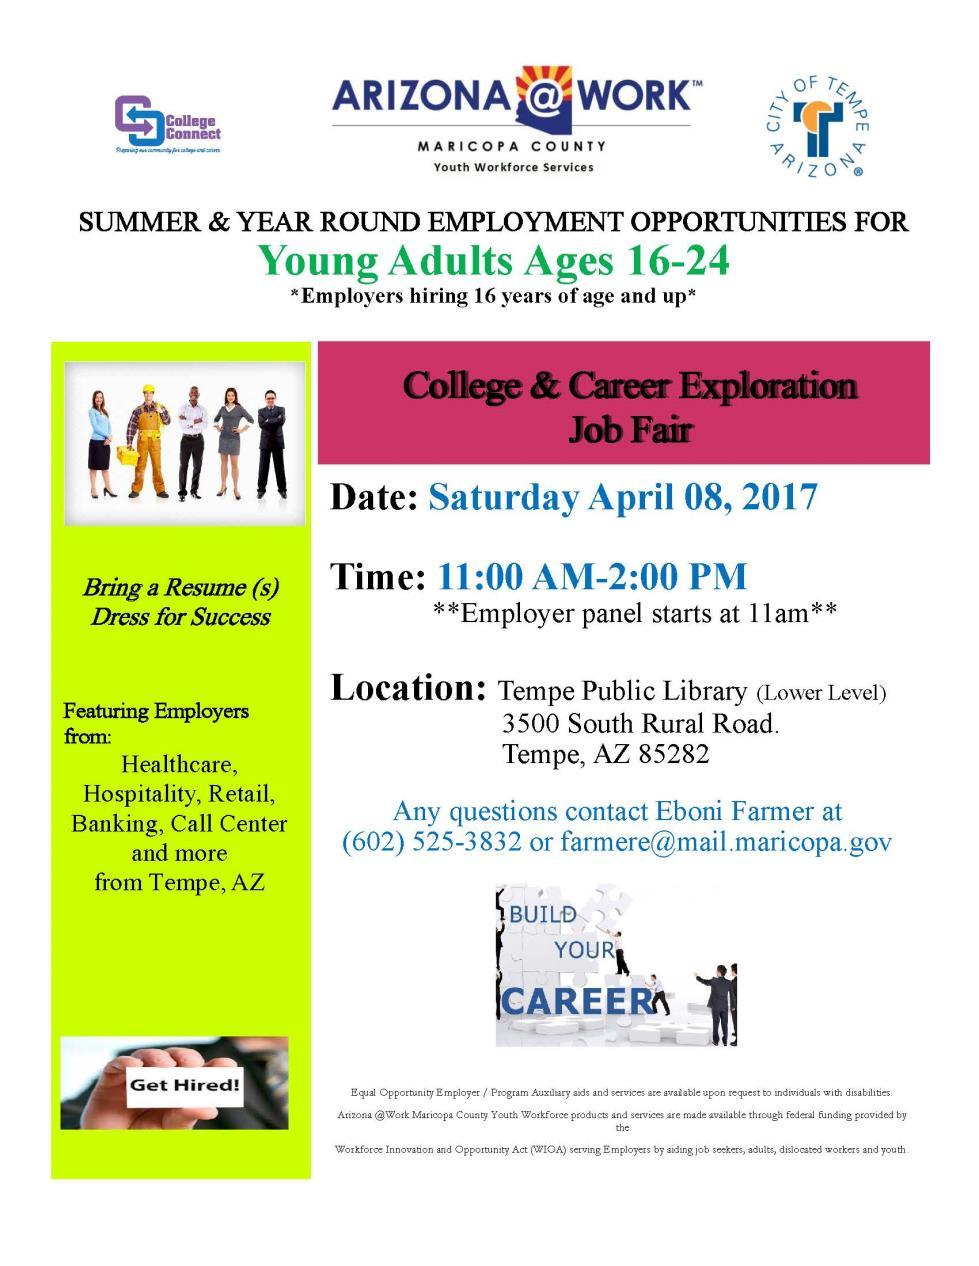 city of az calendar of events meetings college and career exploration job fair rev 02 24 17